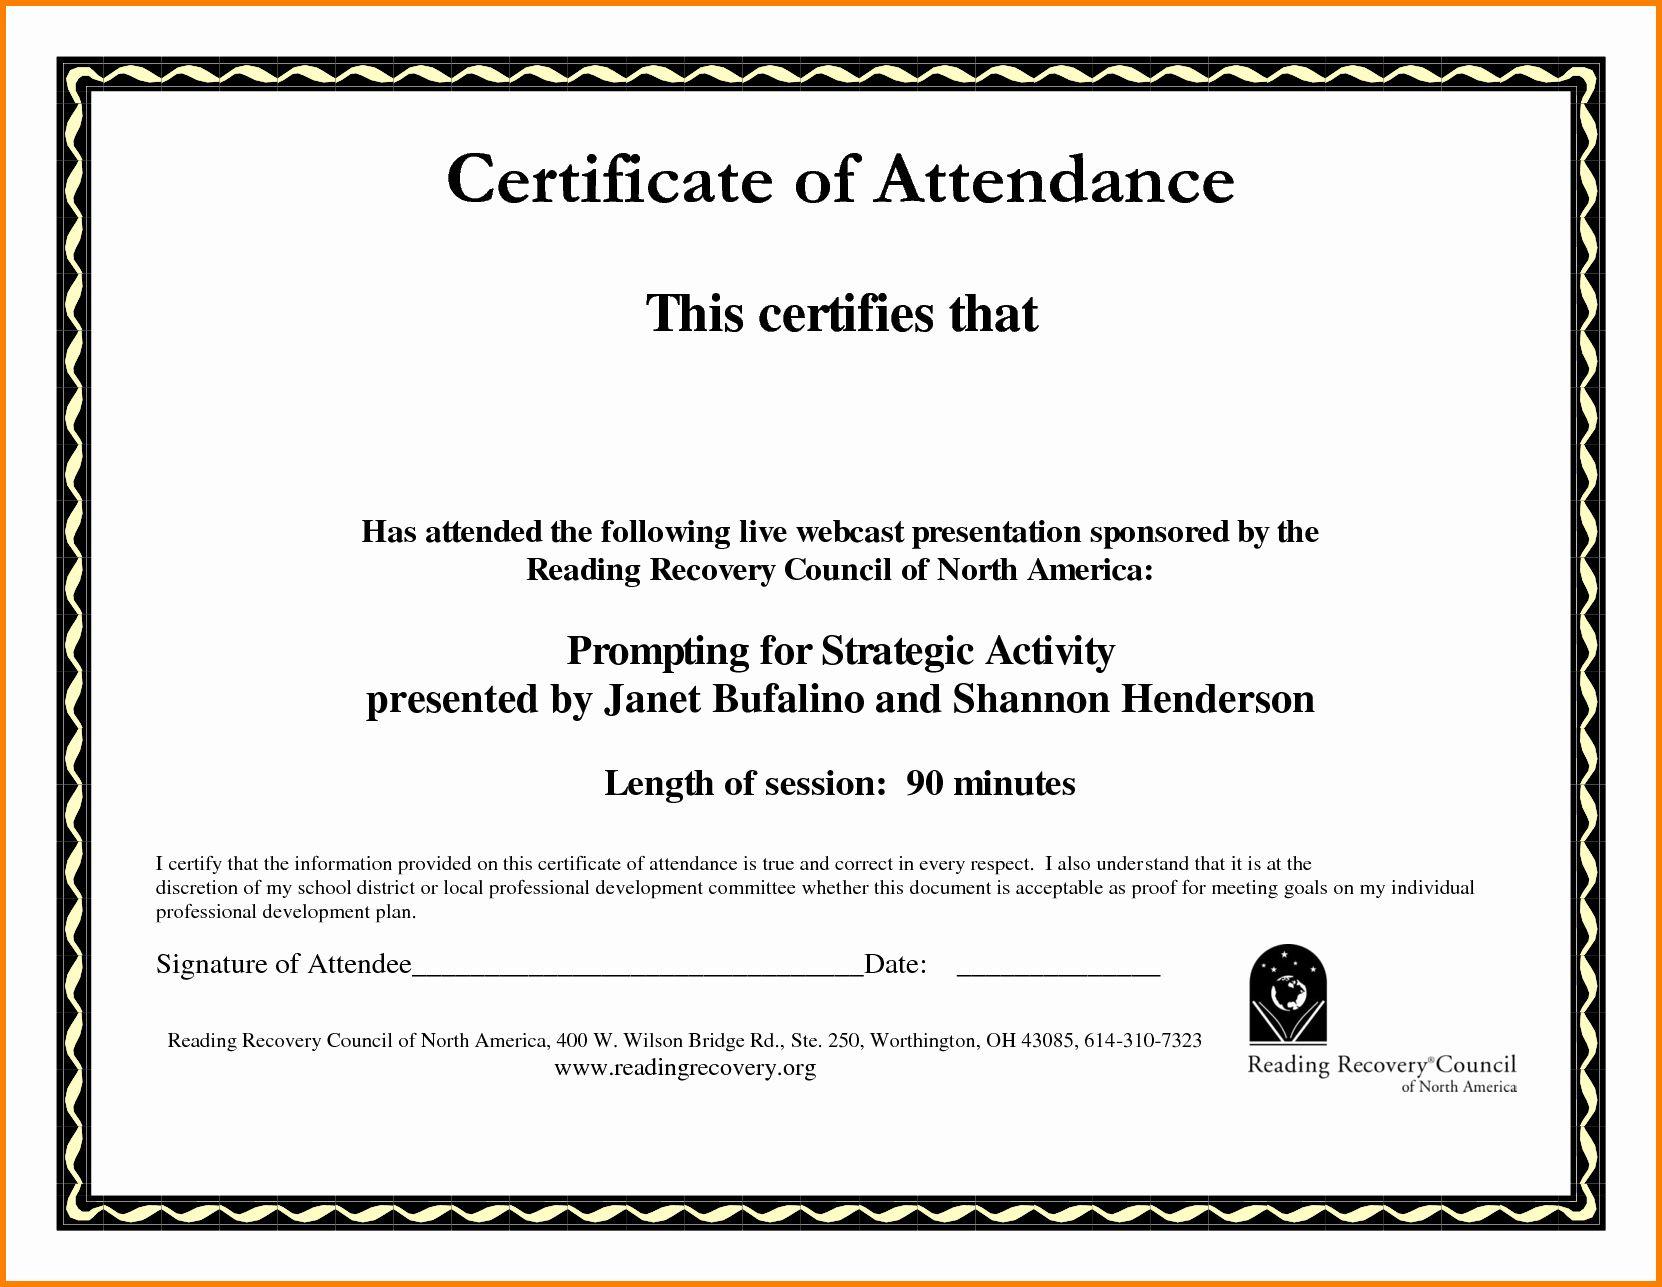 5d91c3bcc794538a7d57e07b4d03c136 Basic Mechanical Diploma Resume Format on